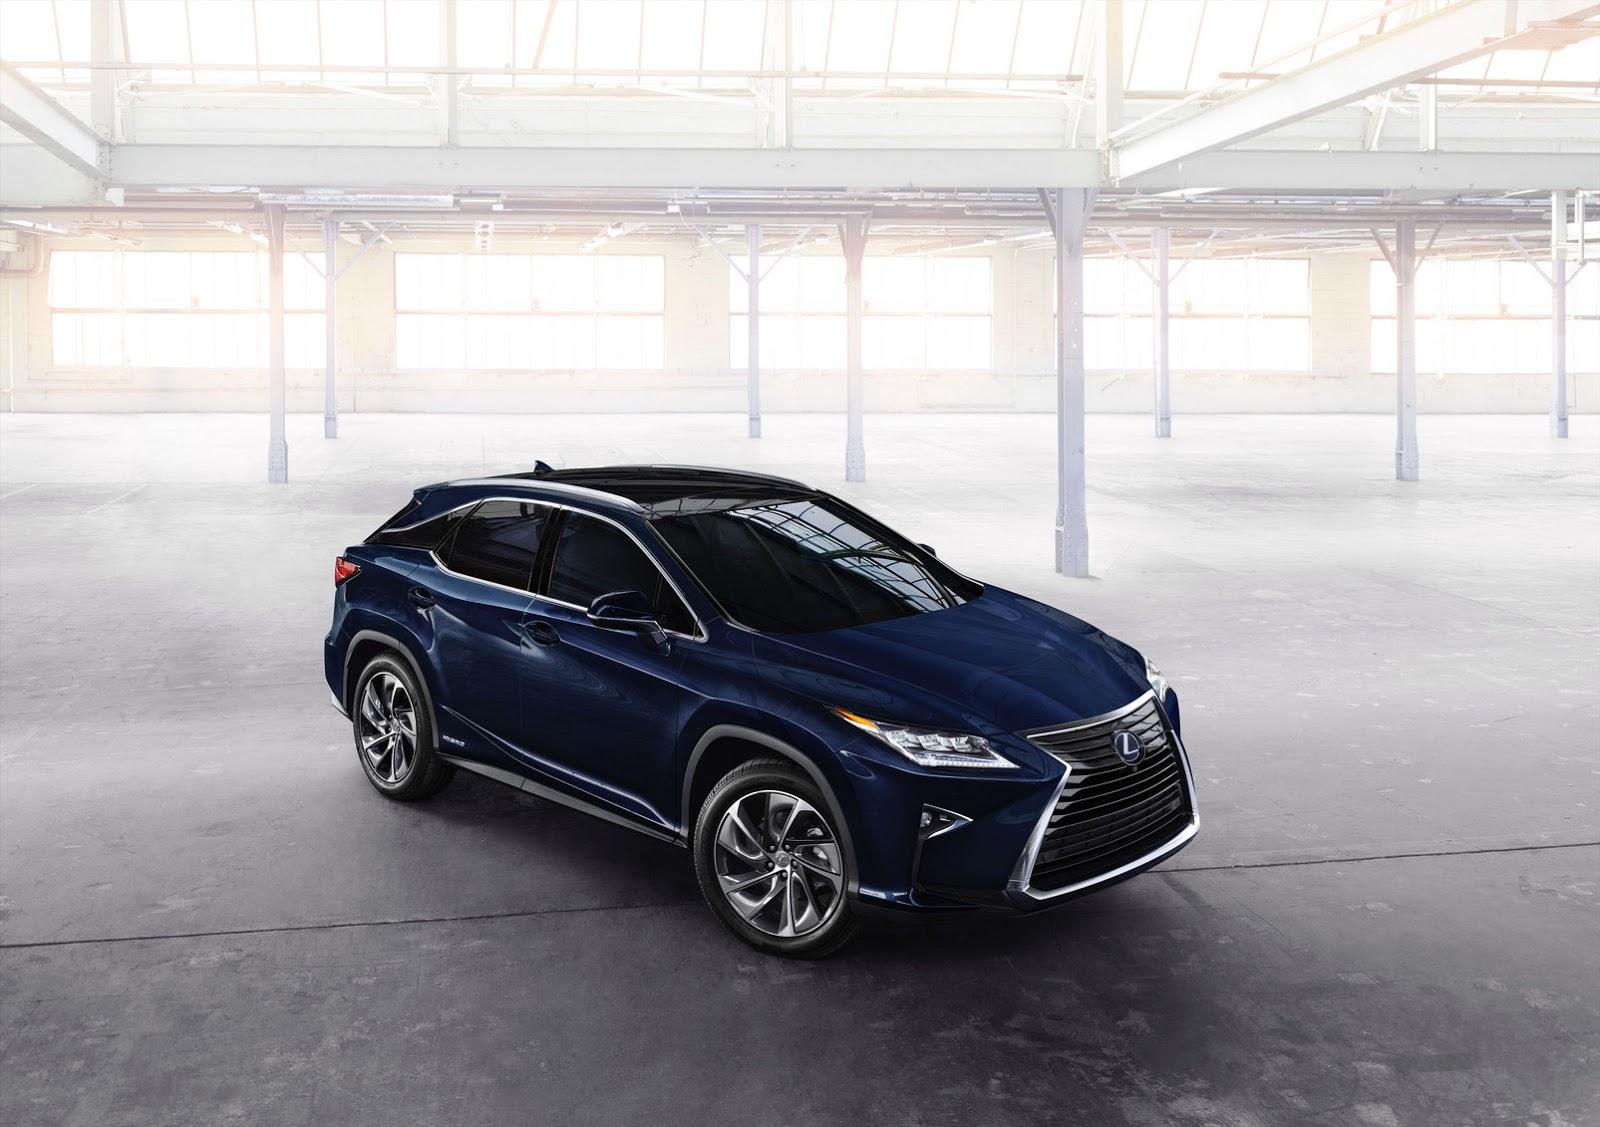 New York Auto Show 2015: Lexus RX 2016 ra mắt